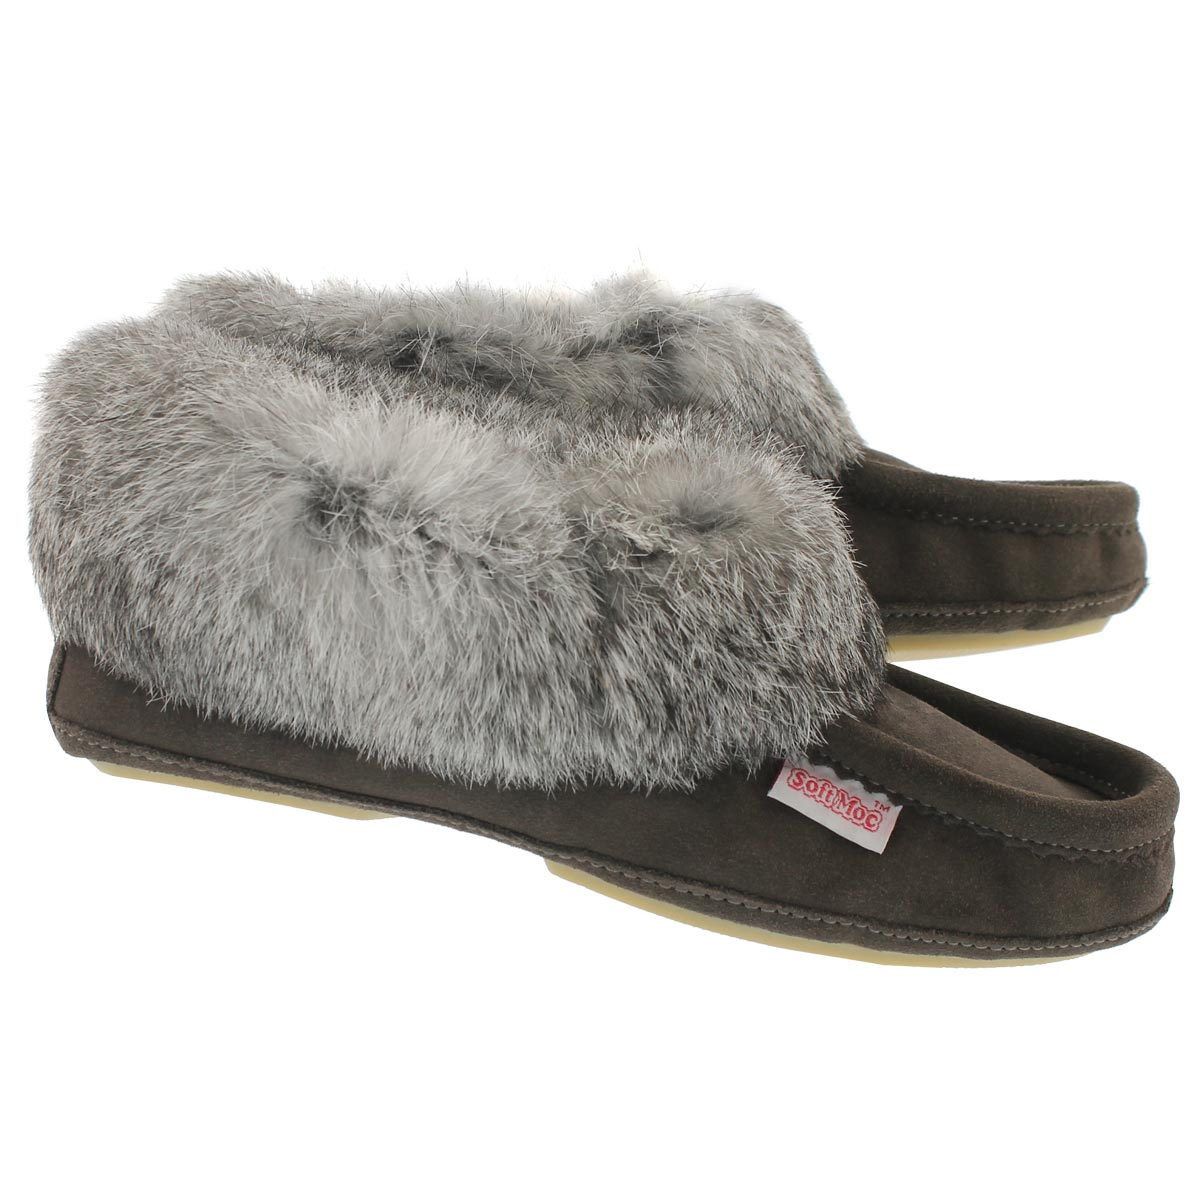 Lds Carrot2 grey sde rabbit fur moccasin